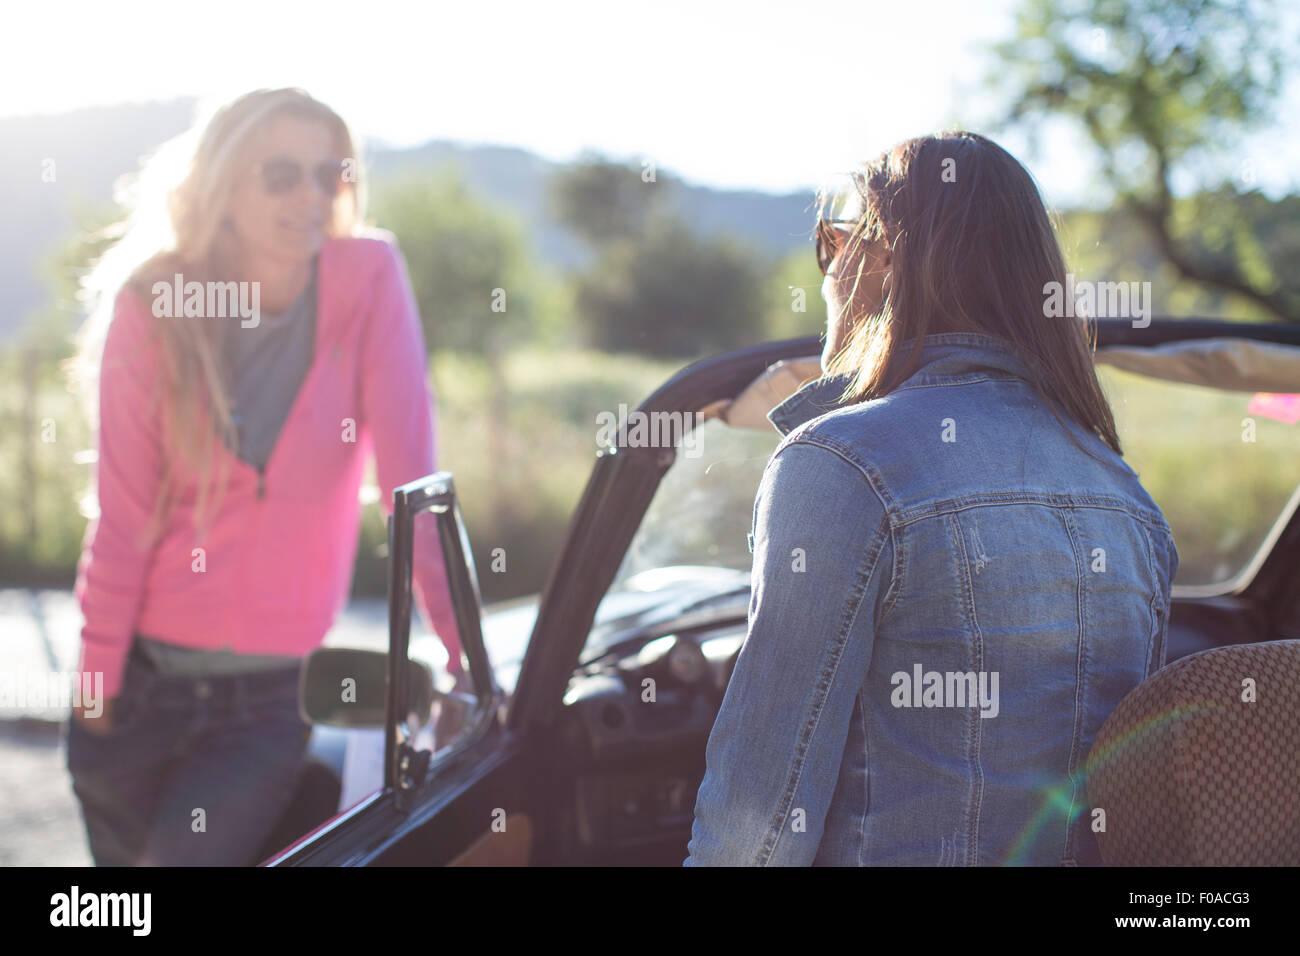 Two mature women, talking, beside convertible car - Stock Image